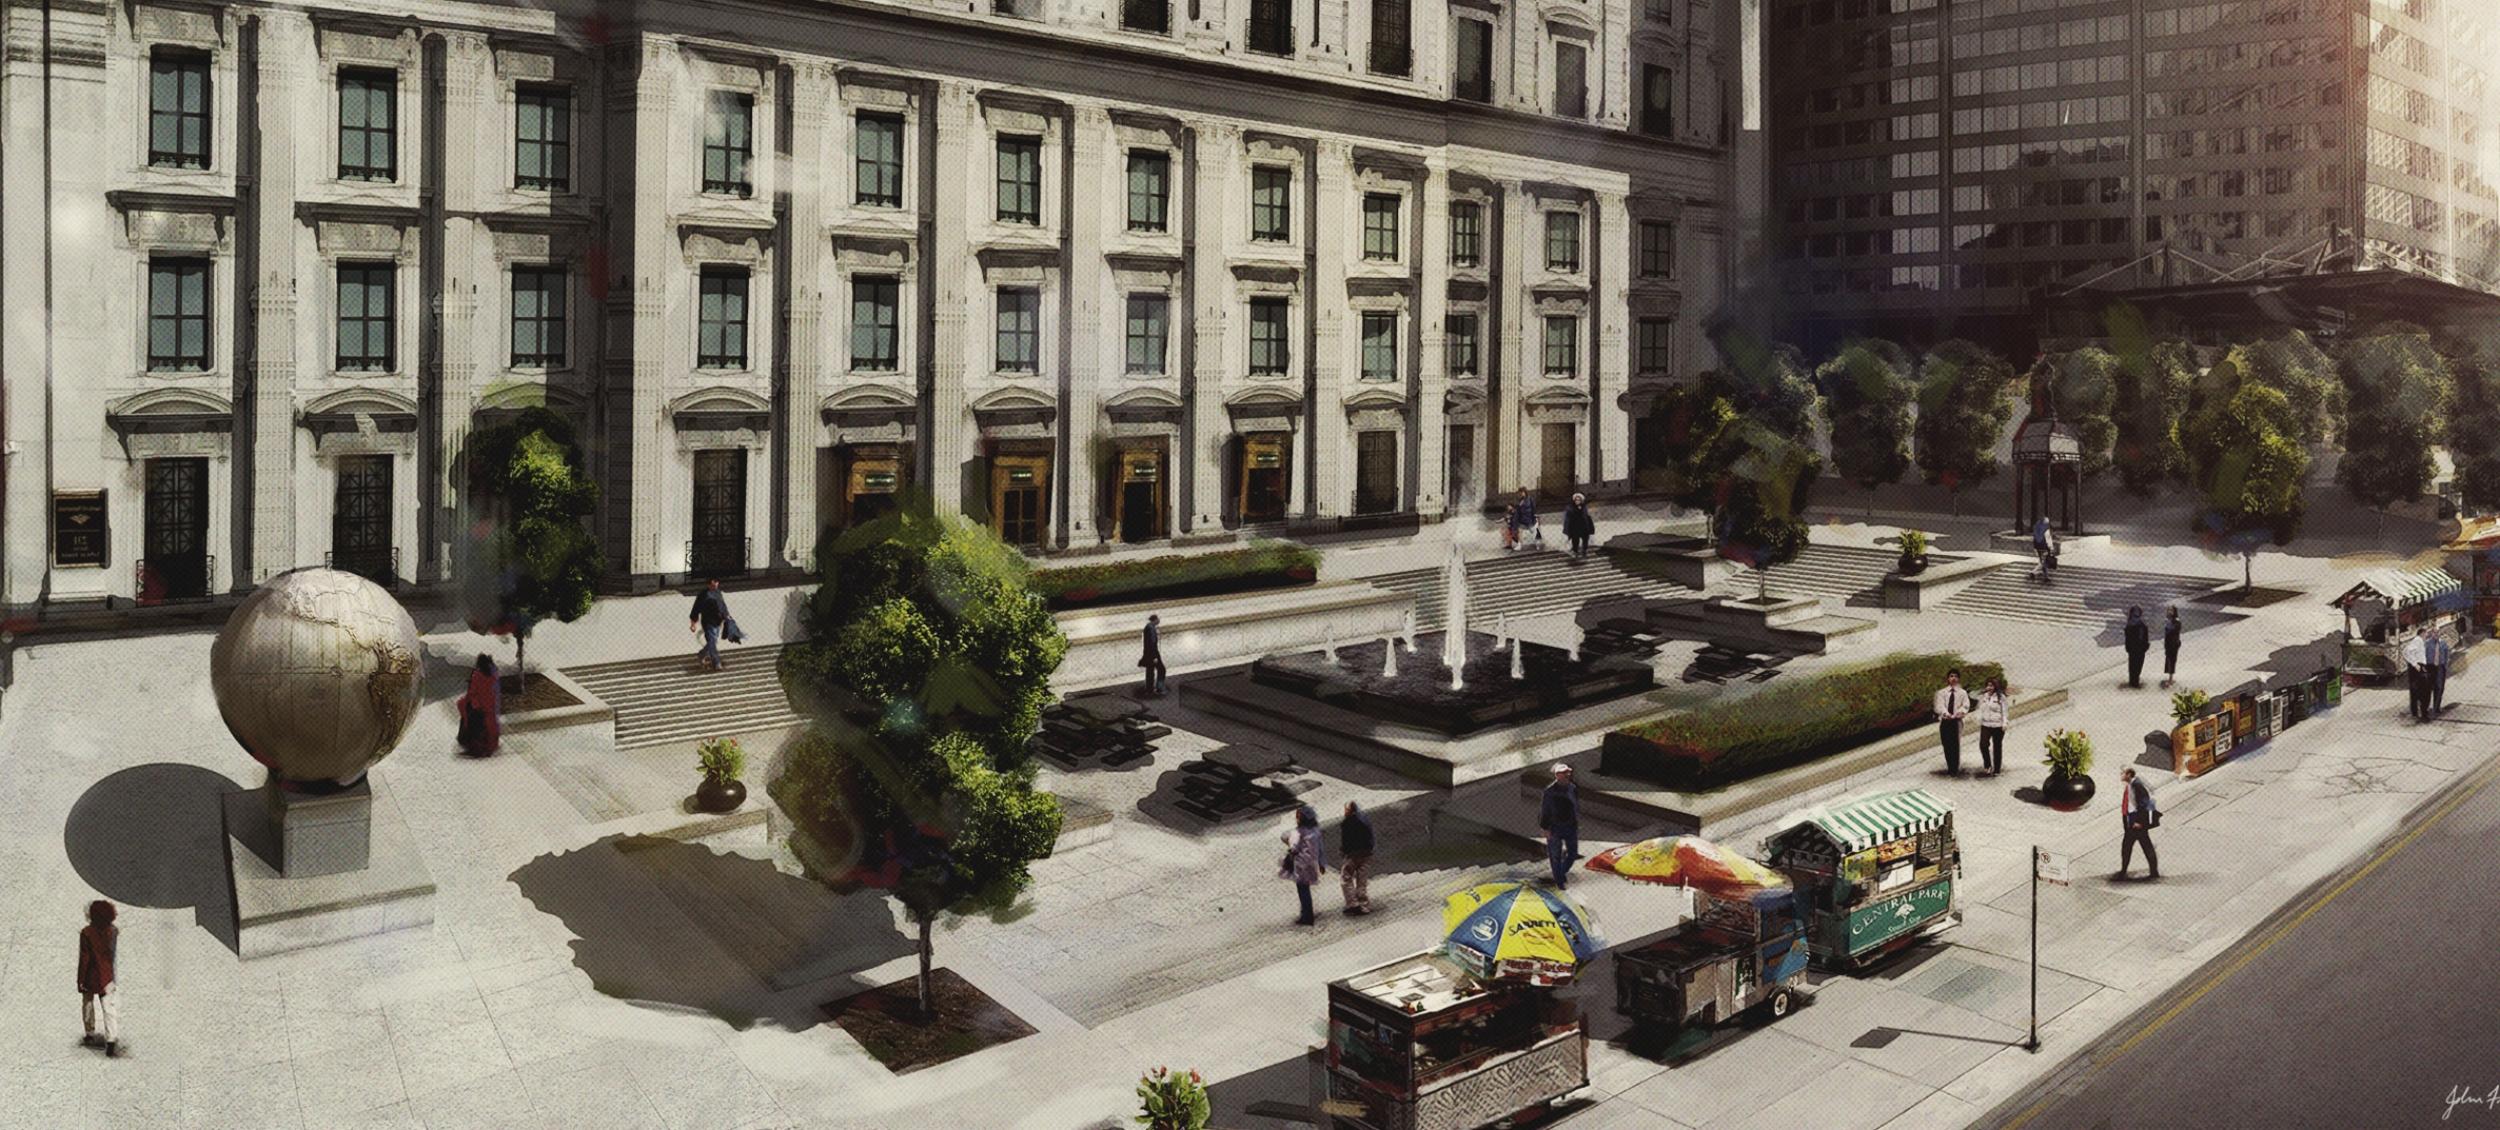 Plaza_Concept.jpg